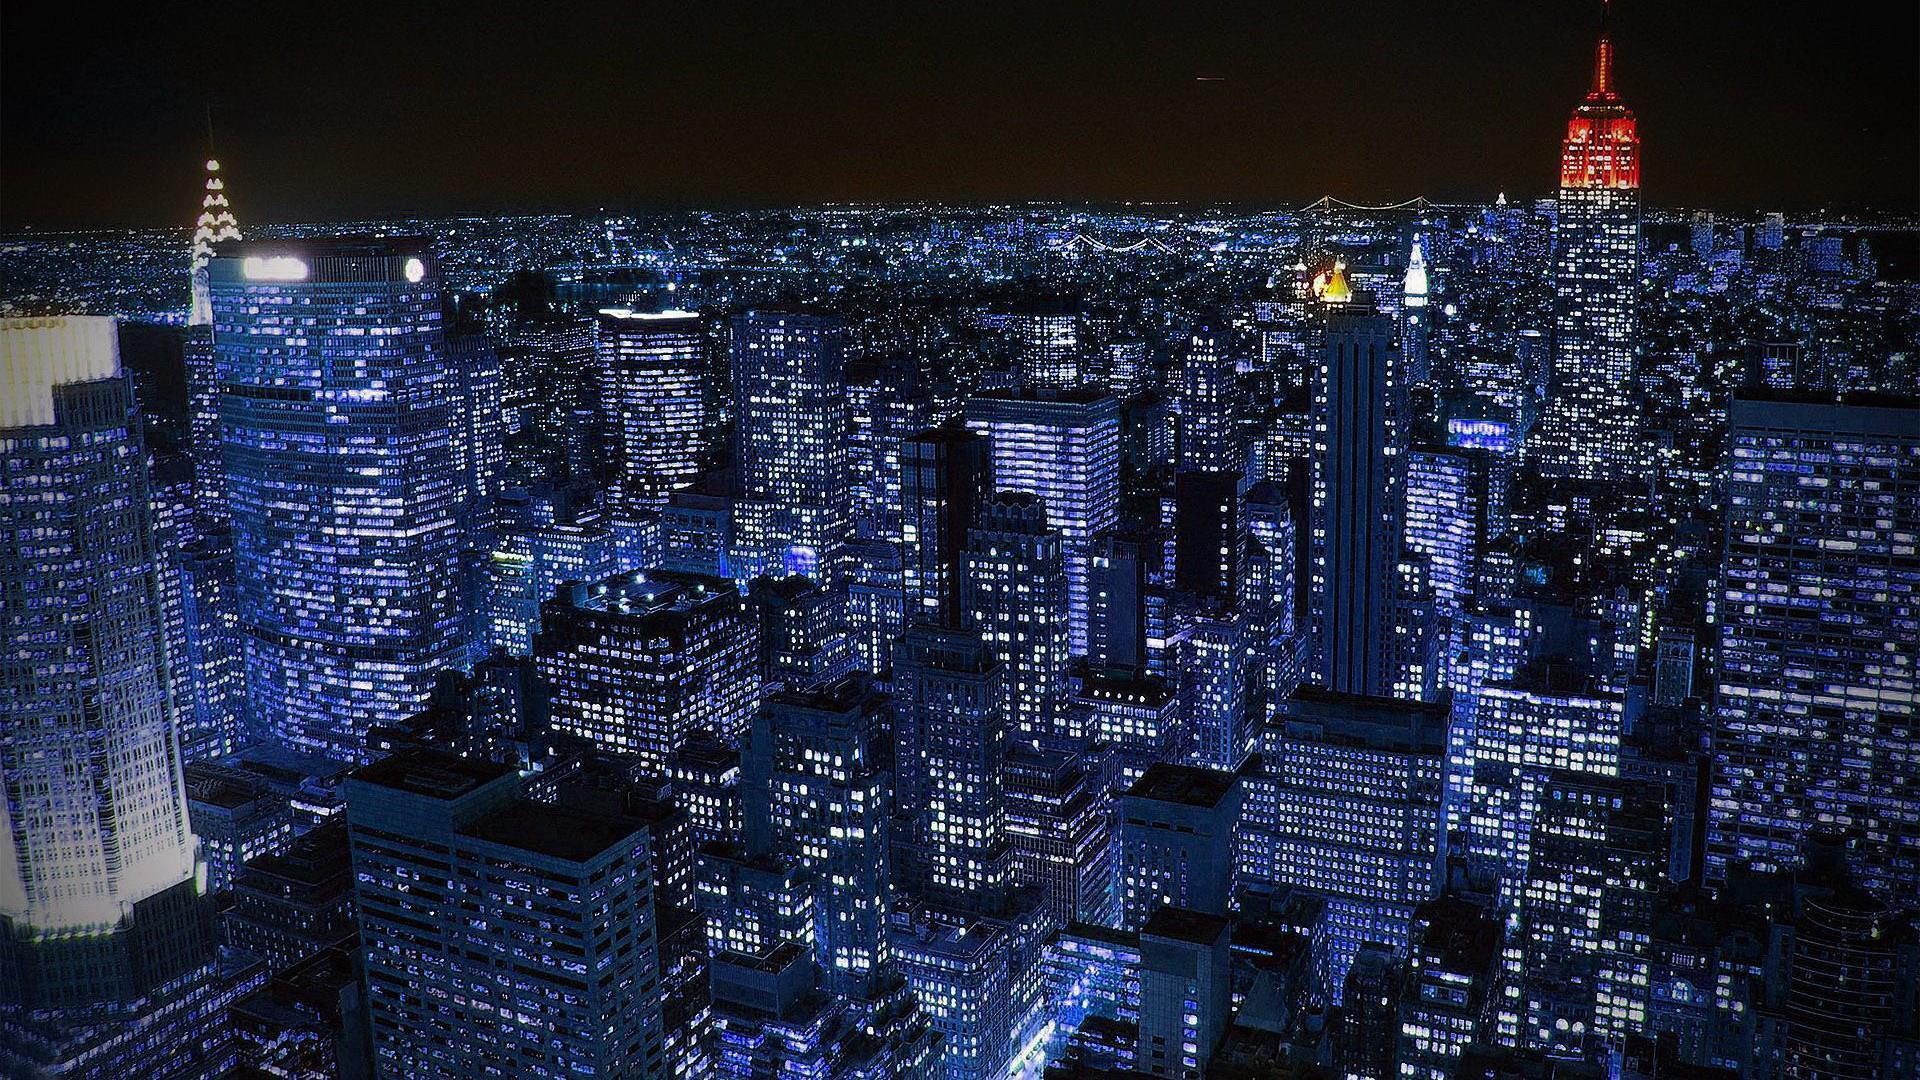 grandes-villes-du-monde-wallpaper_1